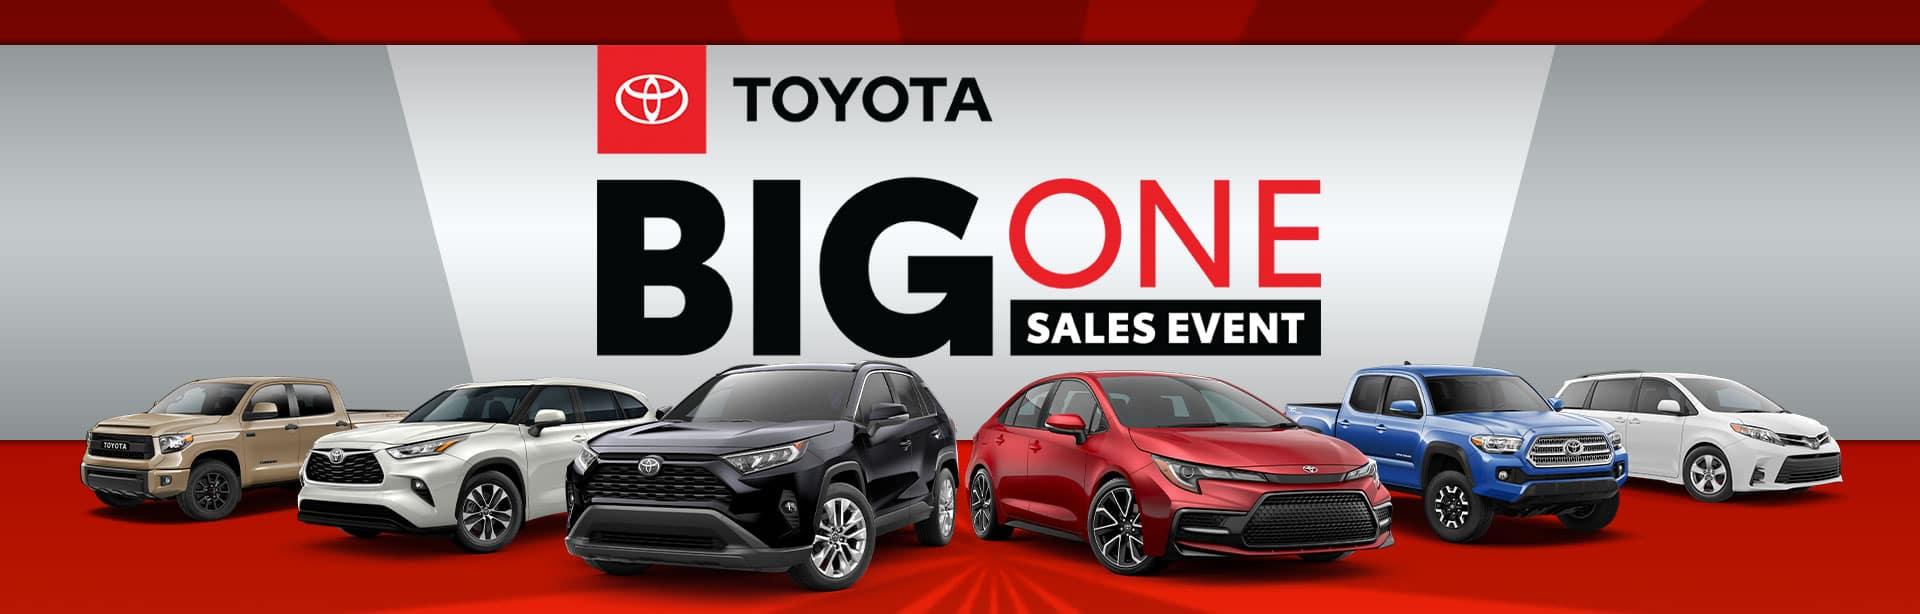 Toyota Big One Sales Event